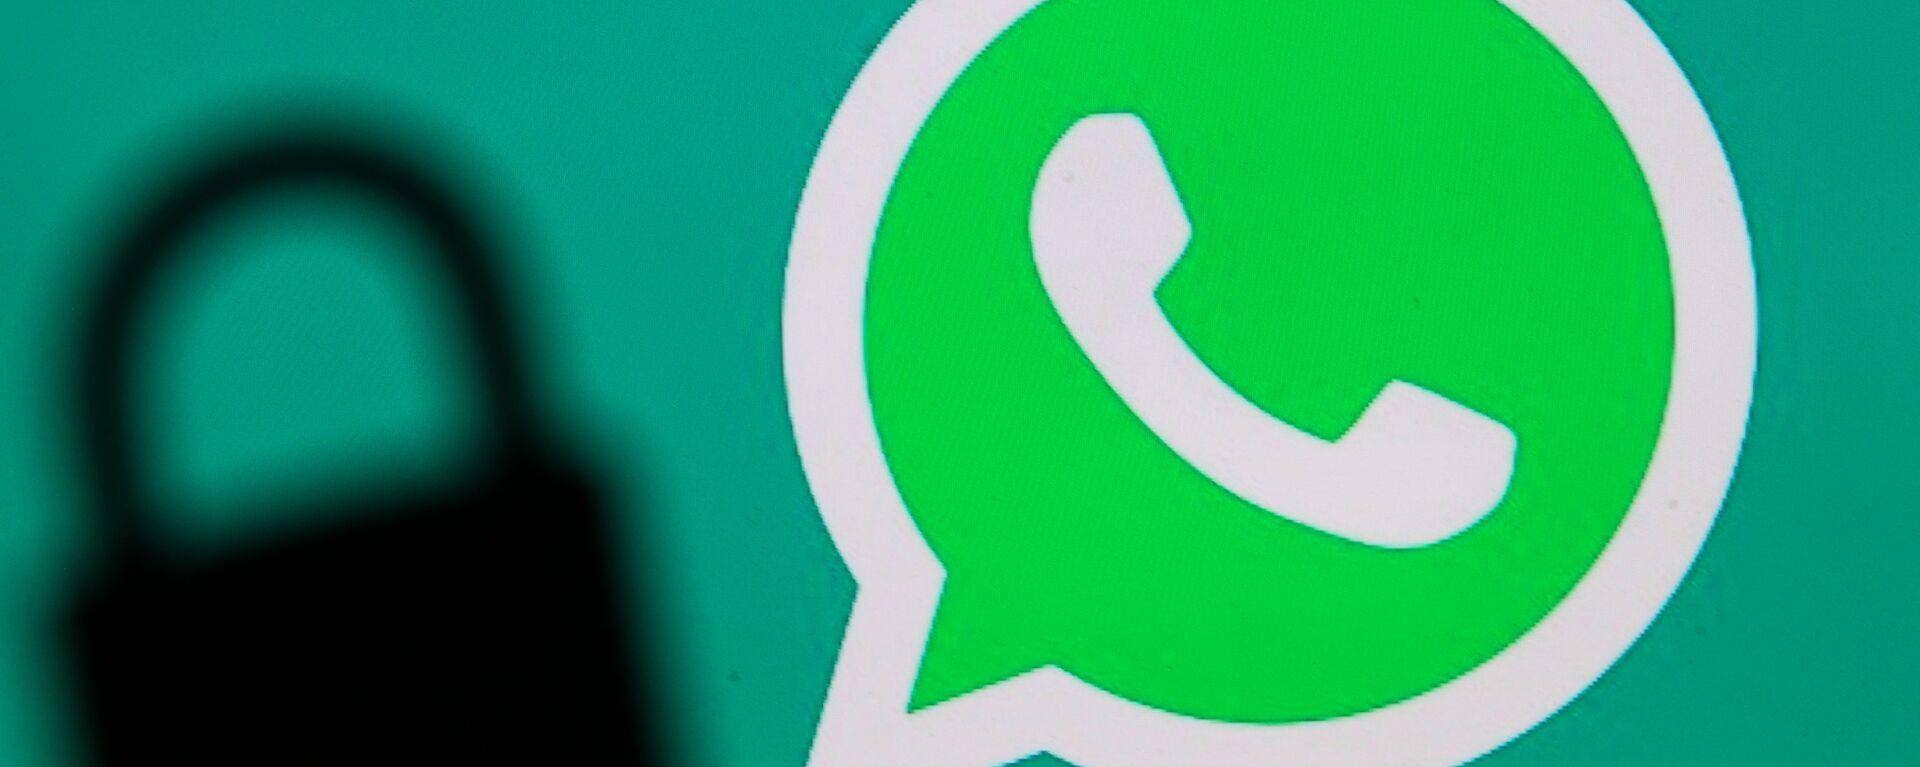 Логотип мессенджера WhatsApp и тень от замка - Sputnik Česká republika, 1920, 20.08.2021